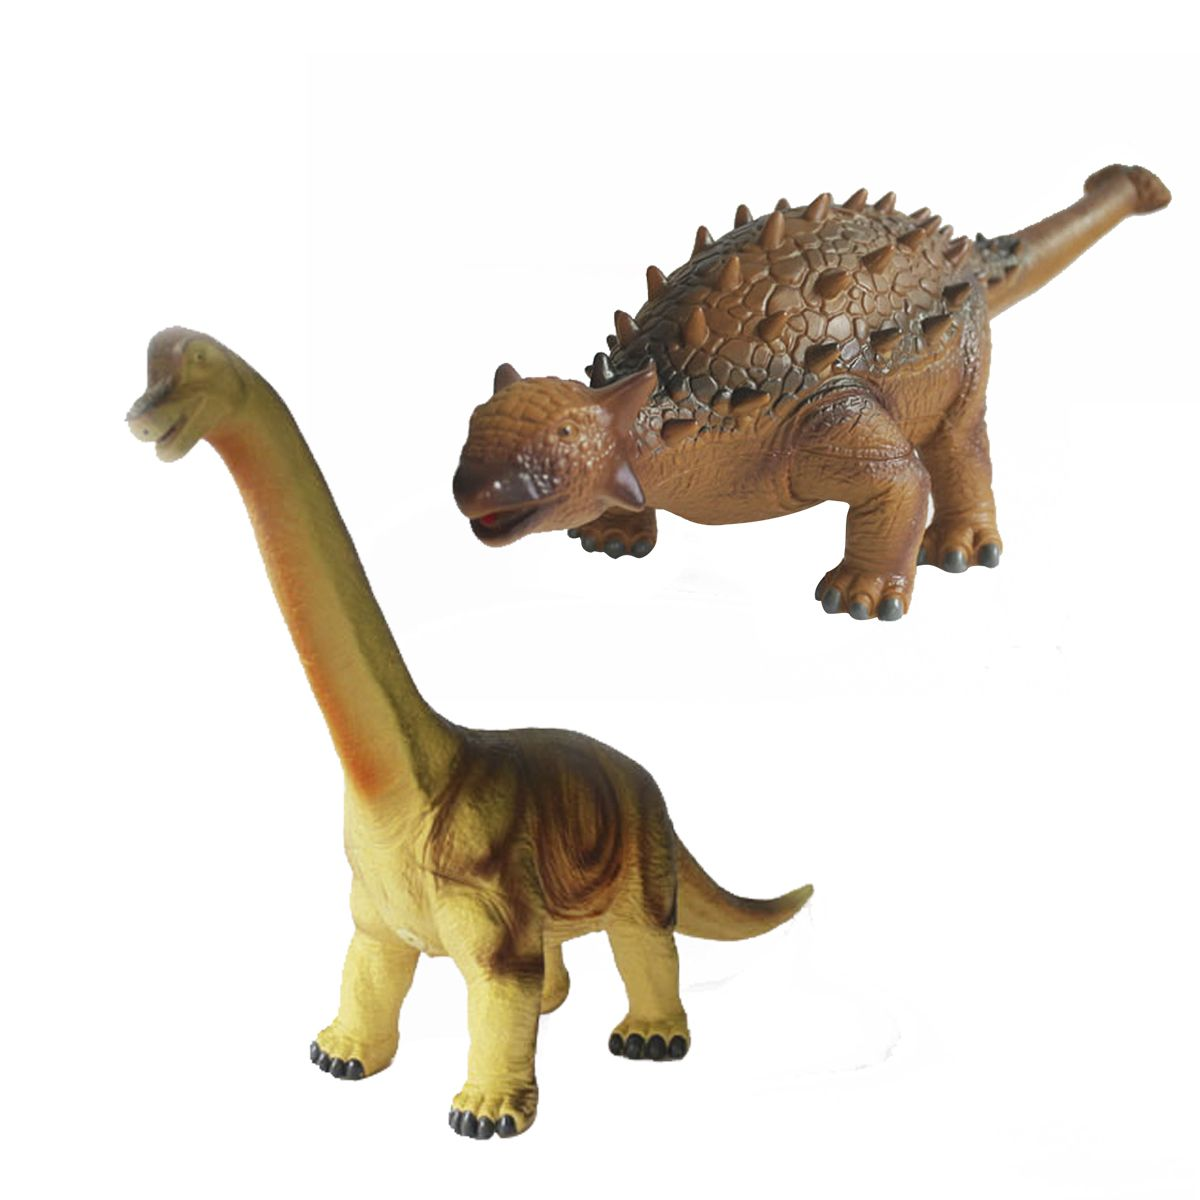 Soft Dinosaur Toys Dinosaur toys, Dinosaur, Pet toys